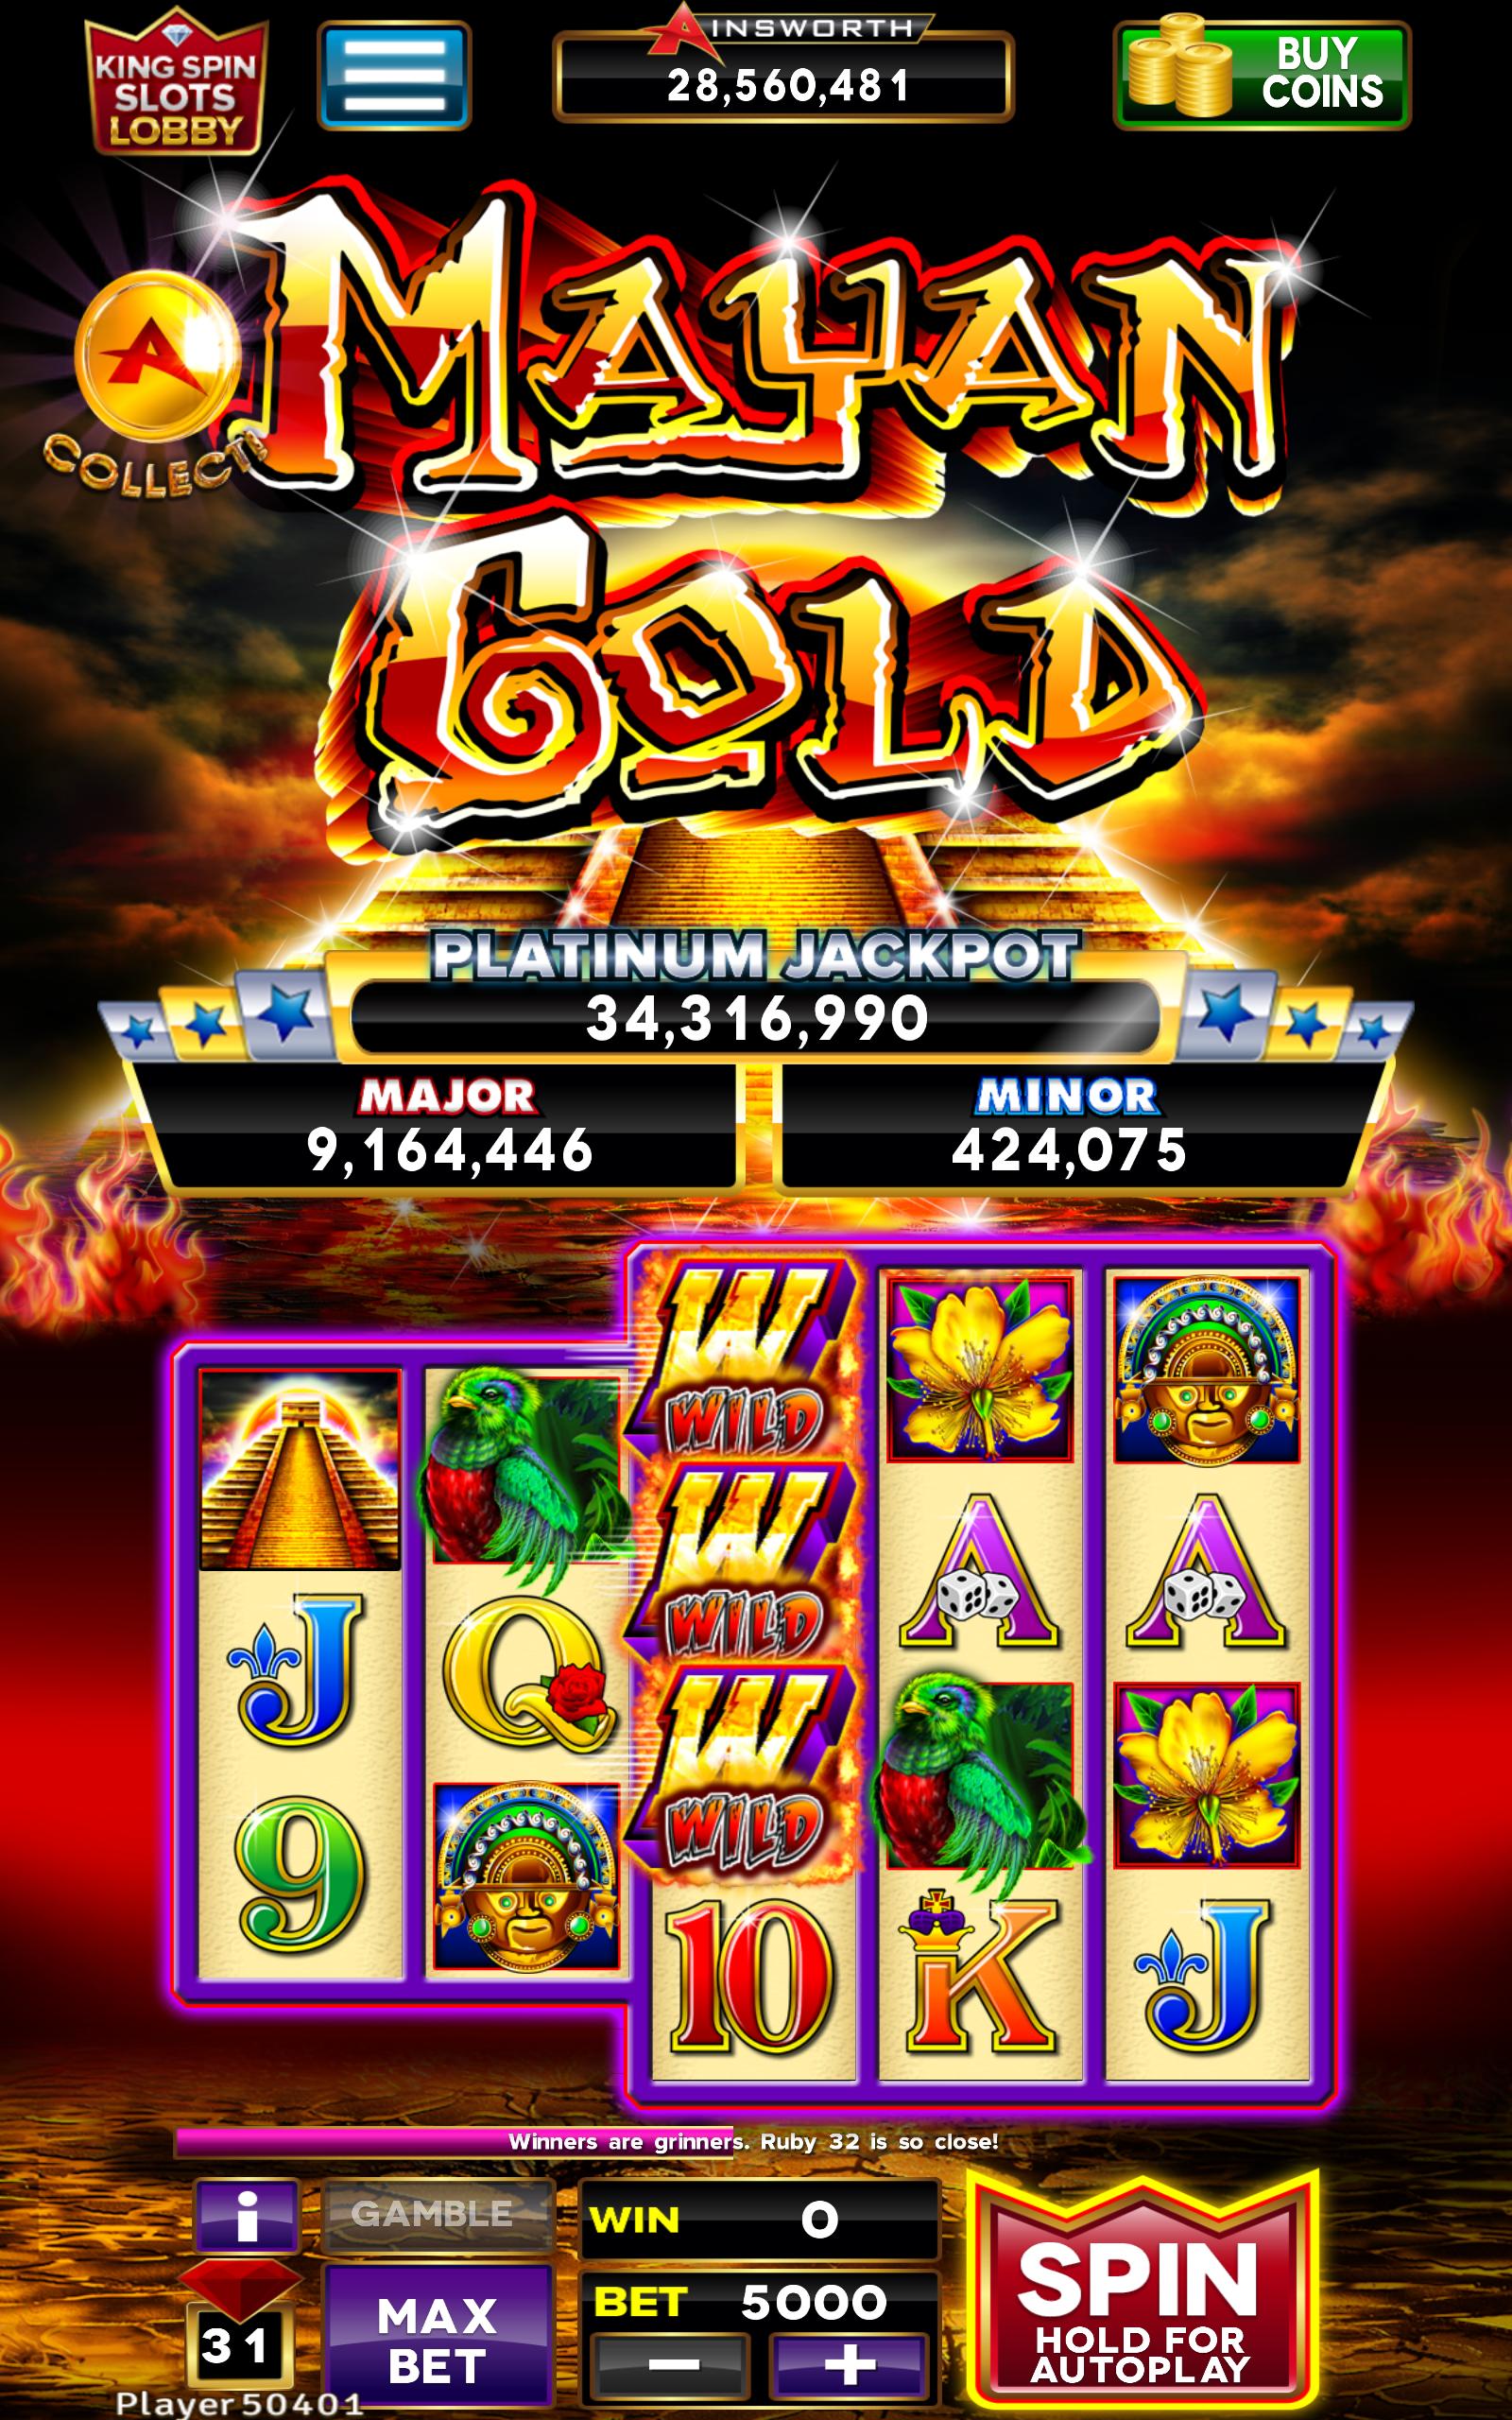 Gsn casino app vmath